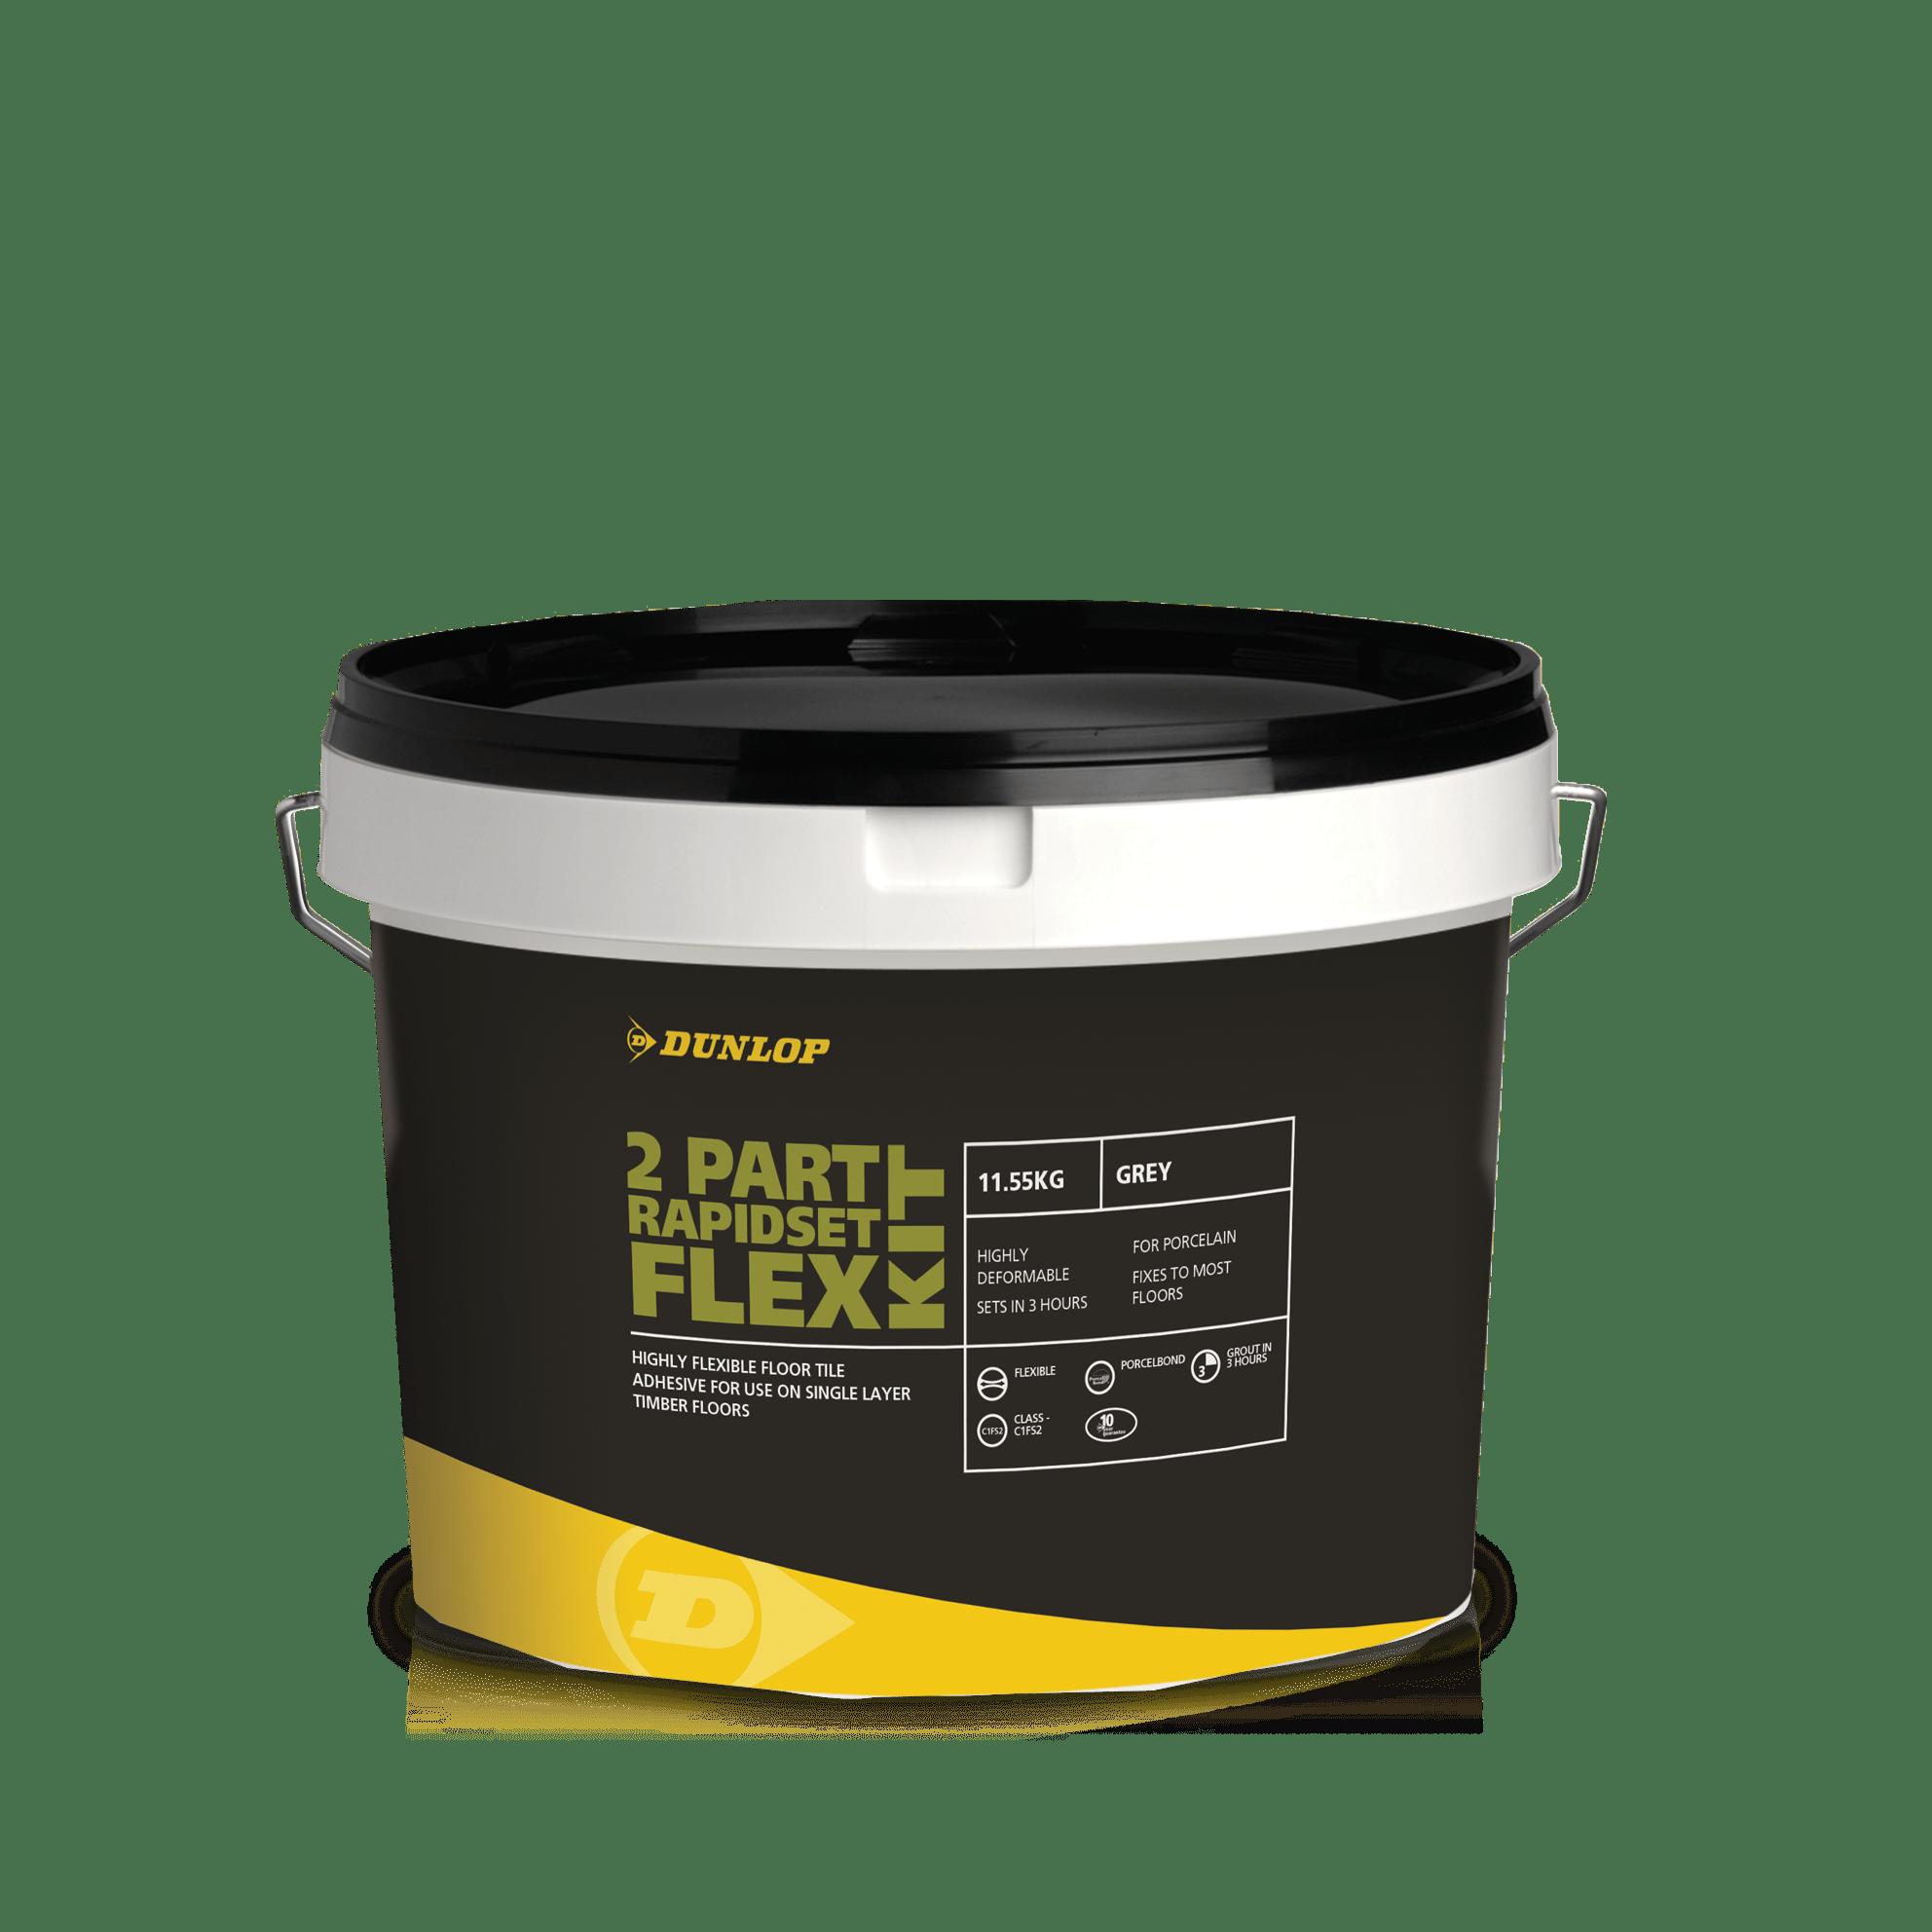 2 Part RapidSet Flex | Tile Adhesives | Dunlop Trade